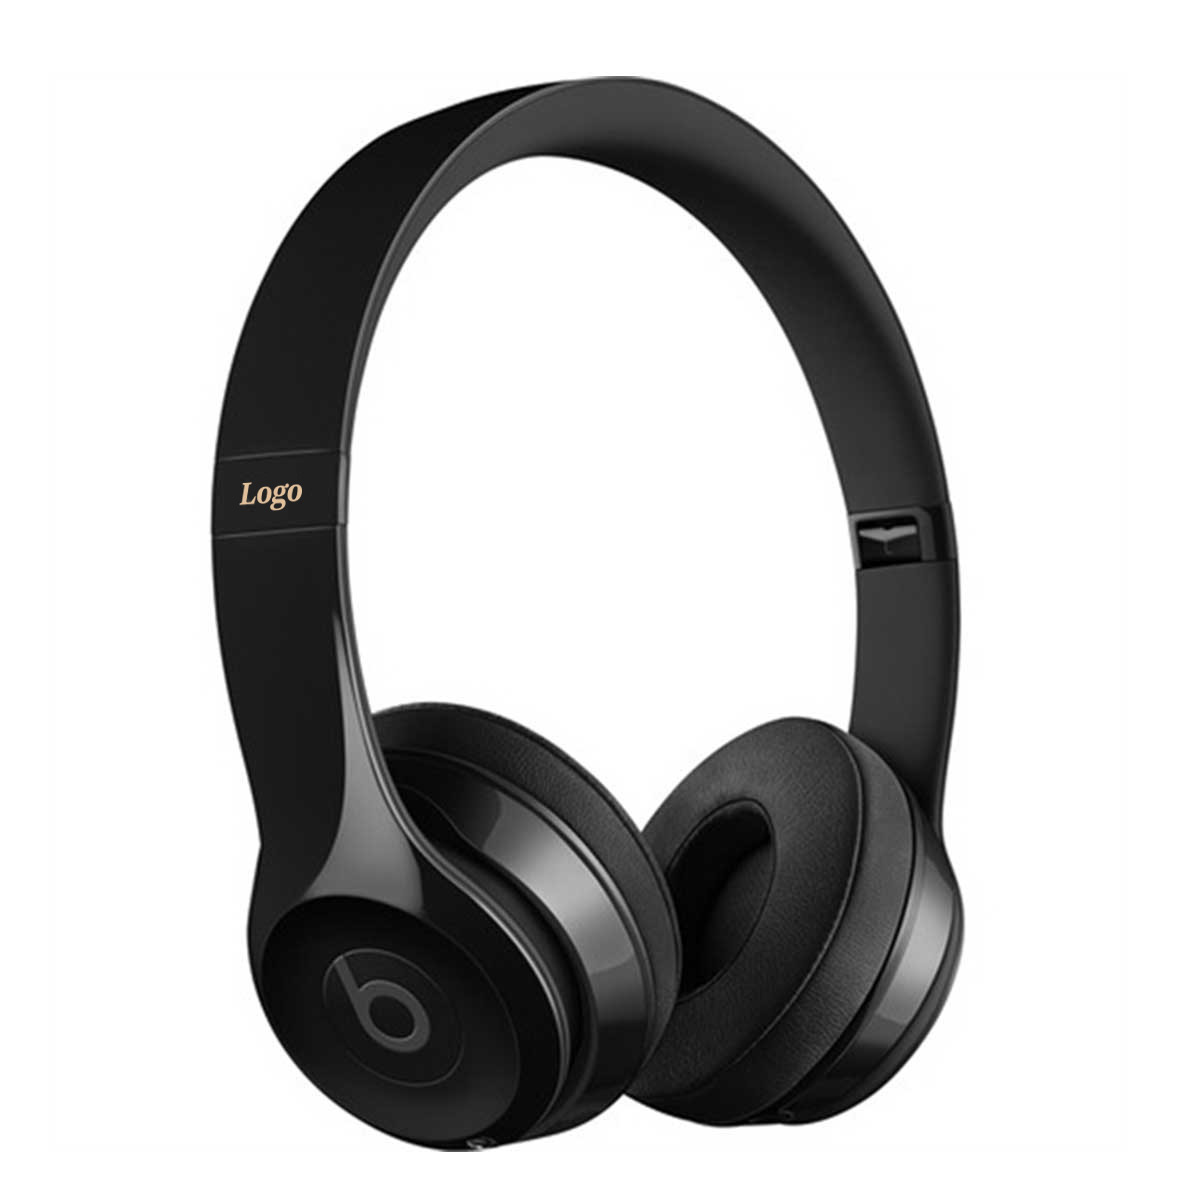 165509 solo3 wireless headphones one color imprint one location